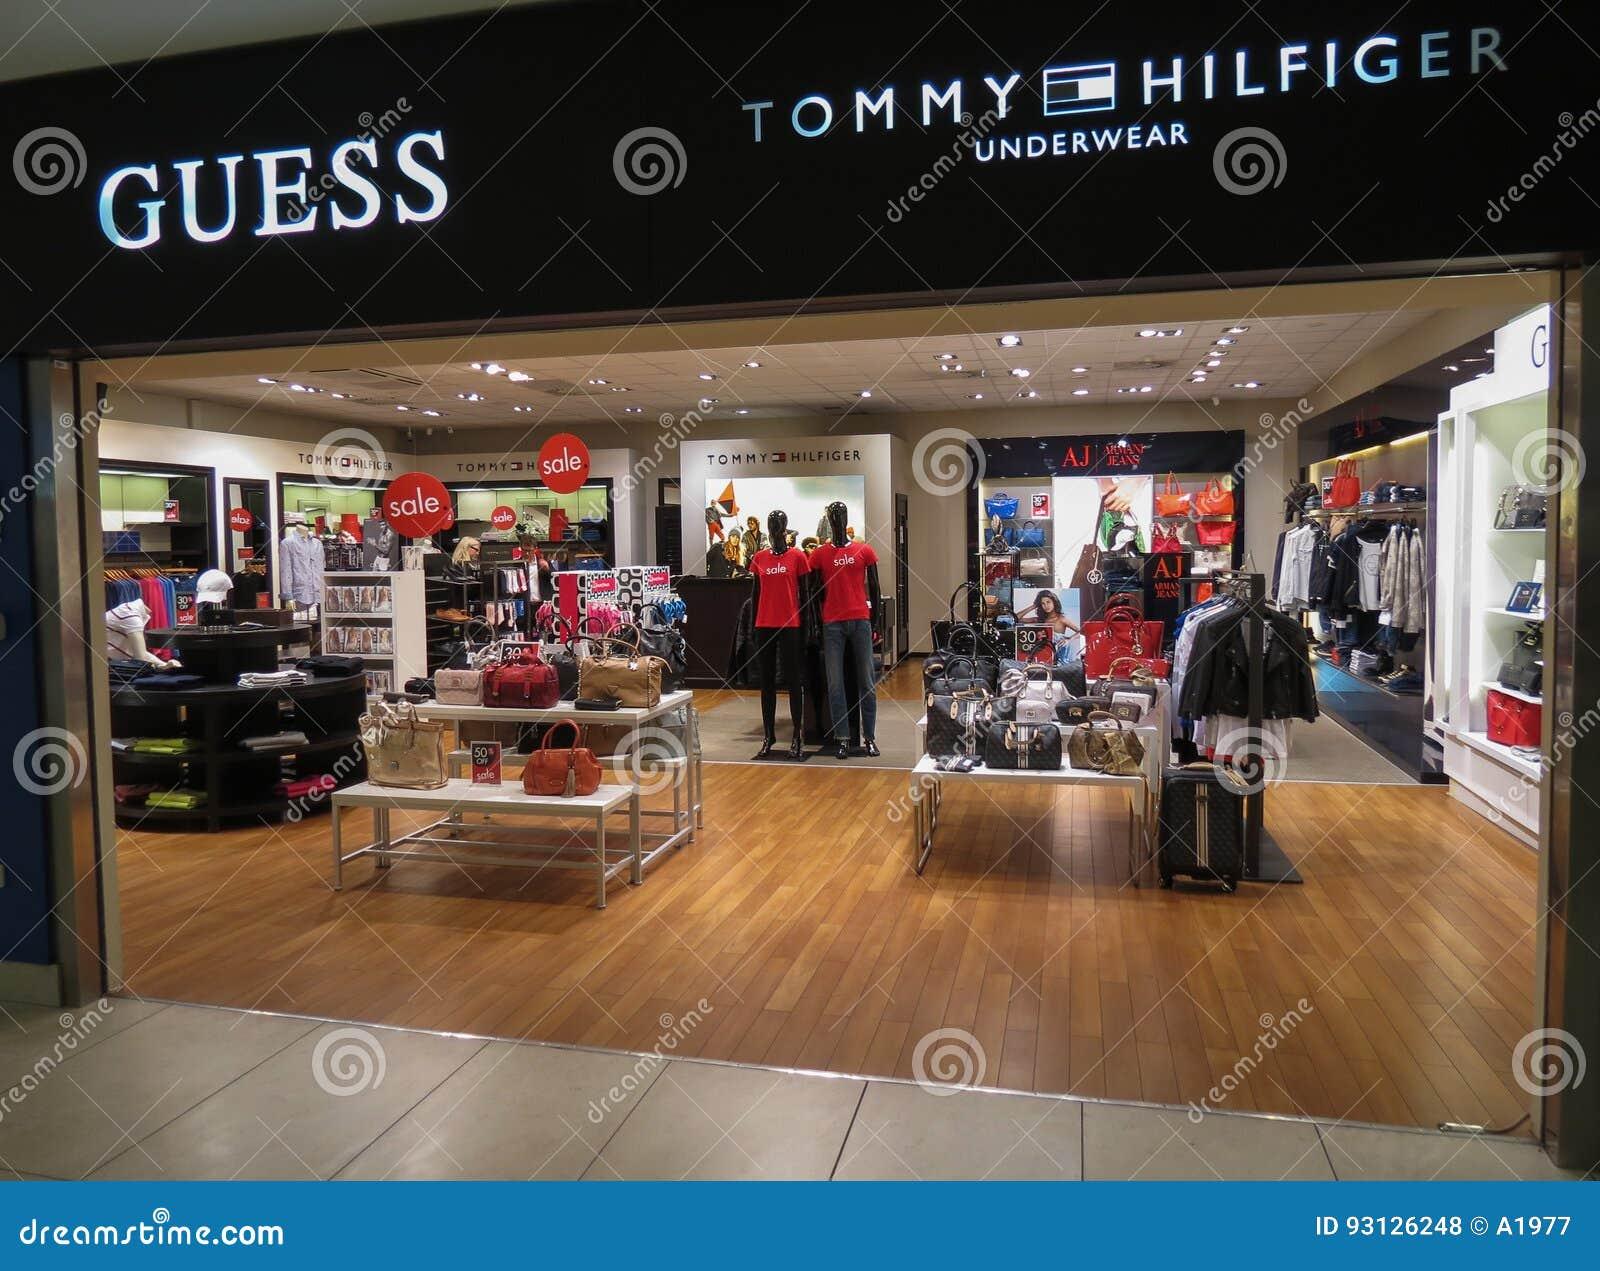 0f8dd39b466f Магазин догадки и Tommy Hilfiger в Праге Редакционное Стоковое Фото ...